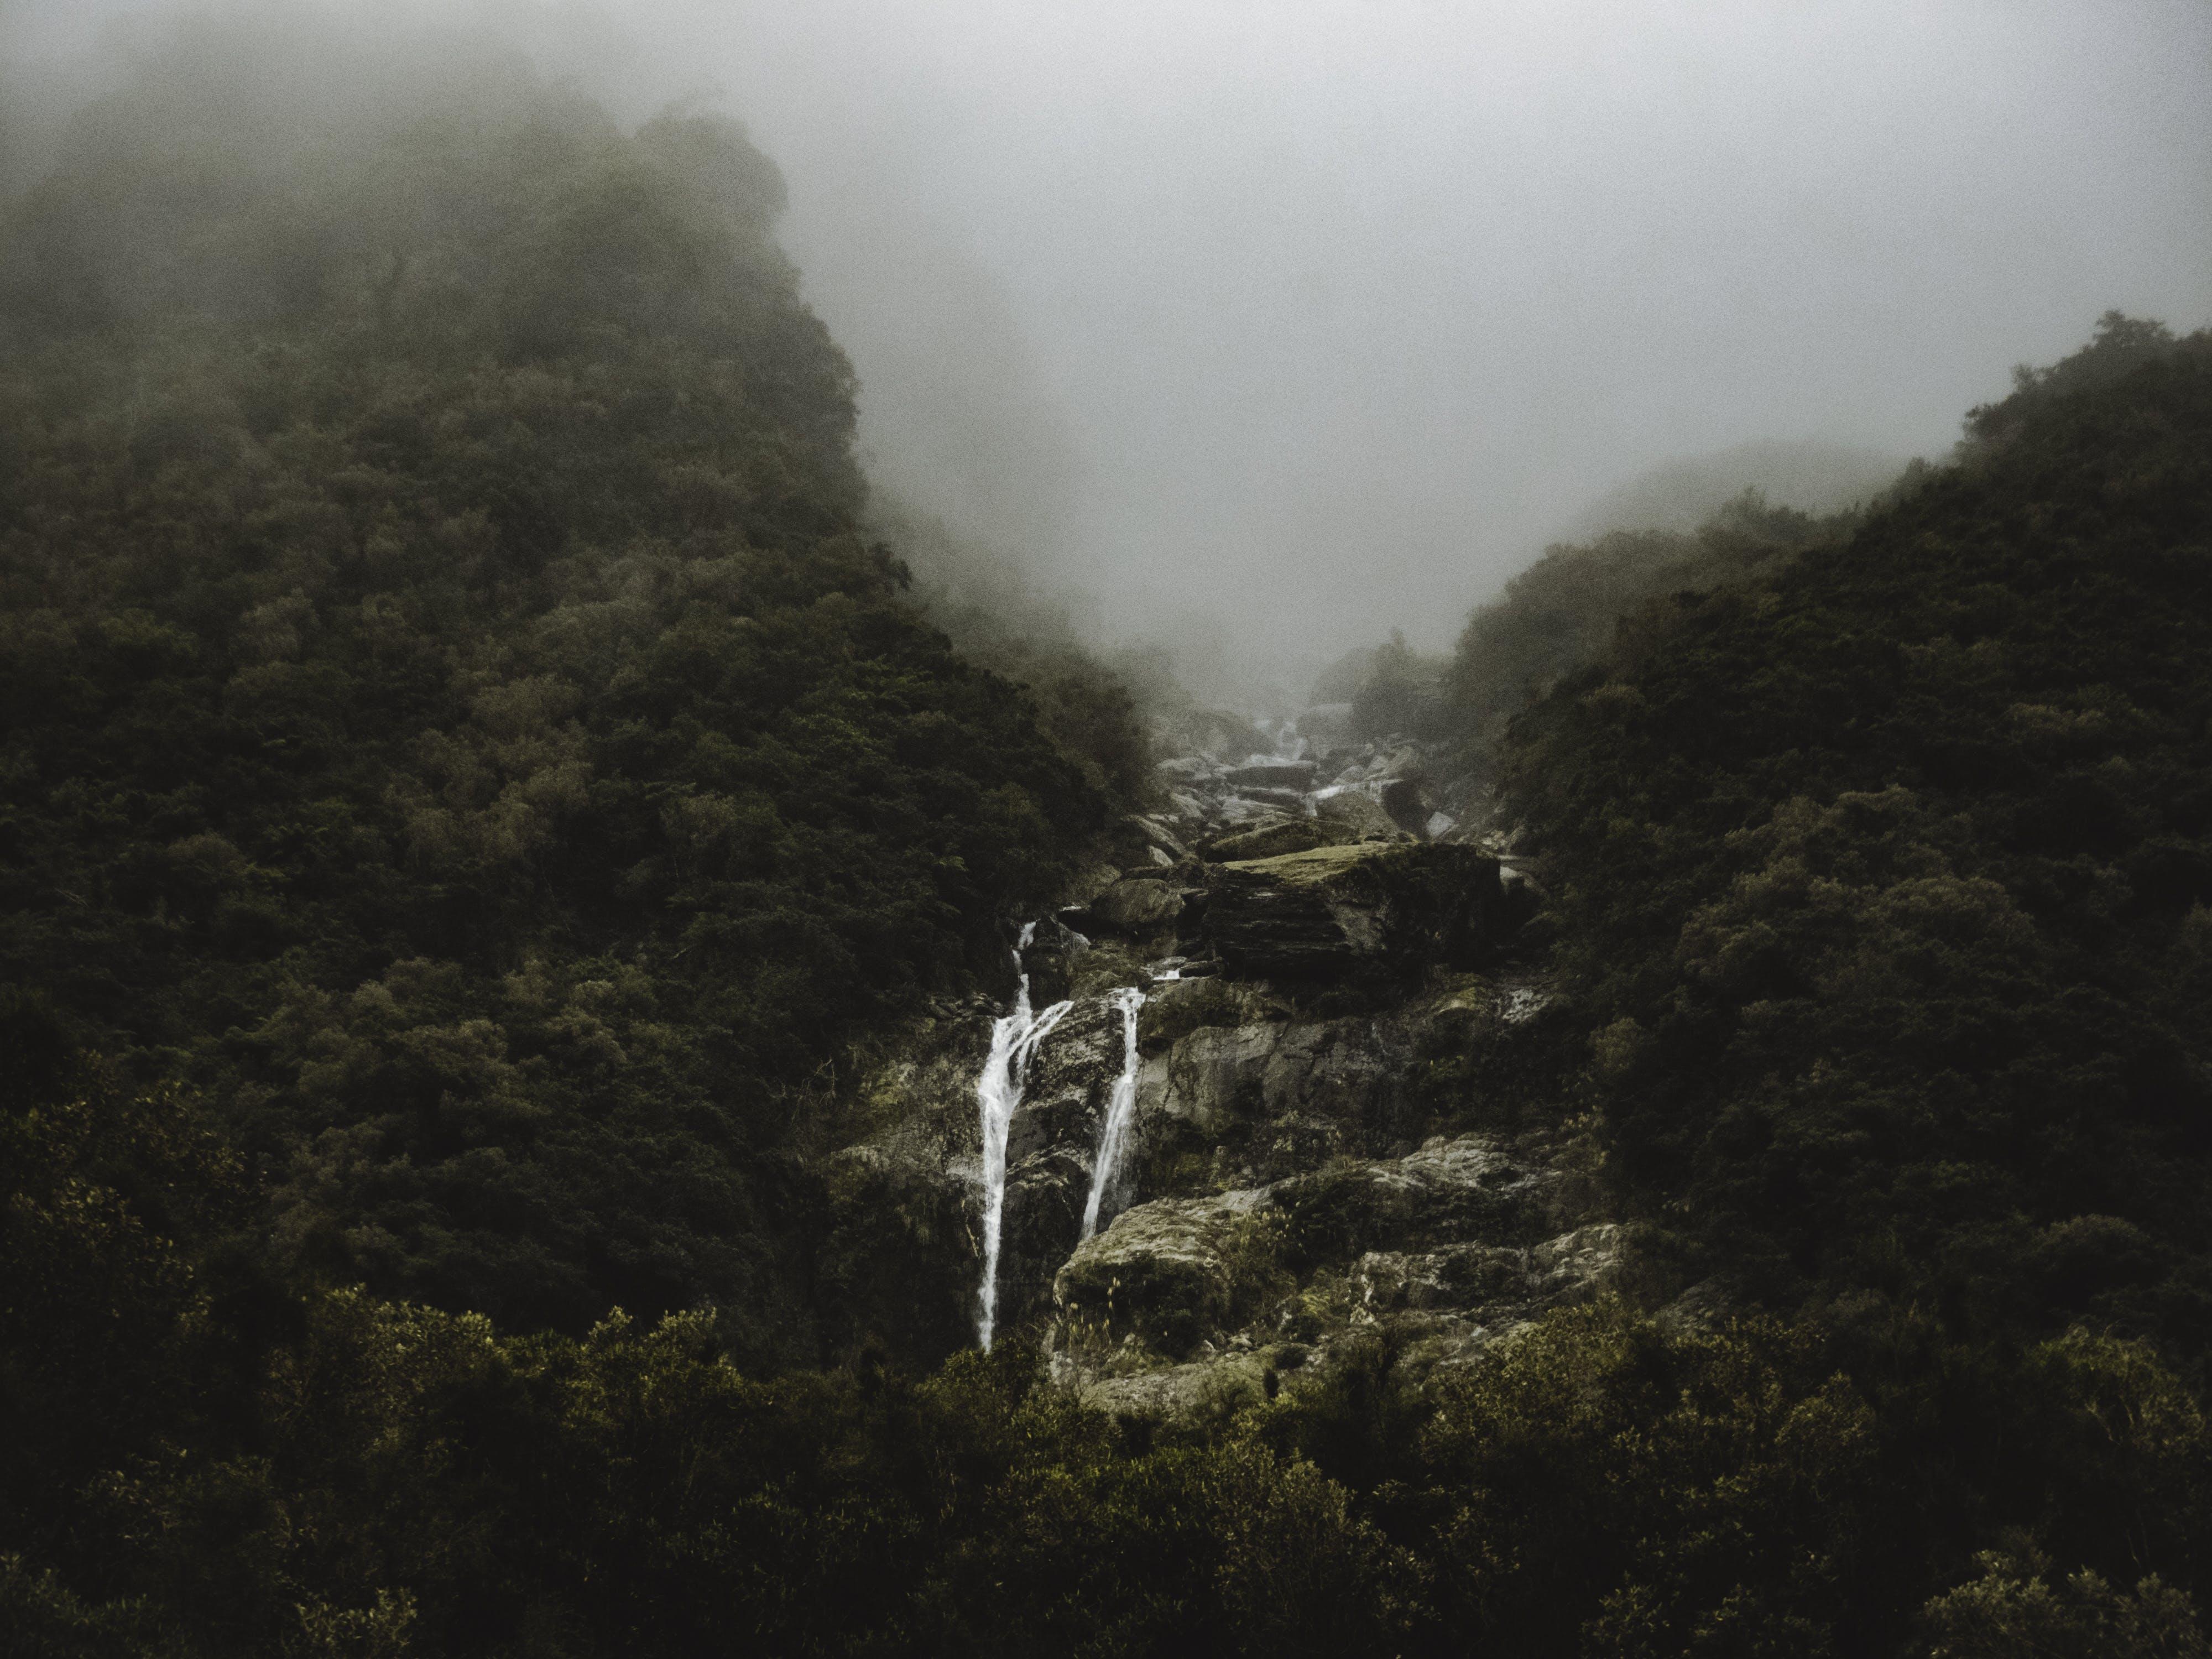 Fotos de stock gratuitas de acantilado, agua, alto, arboles